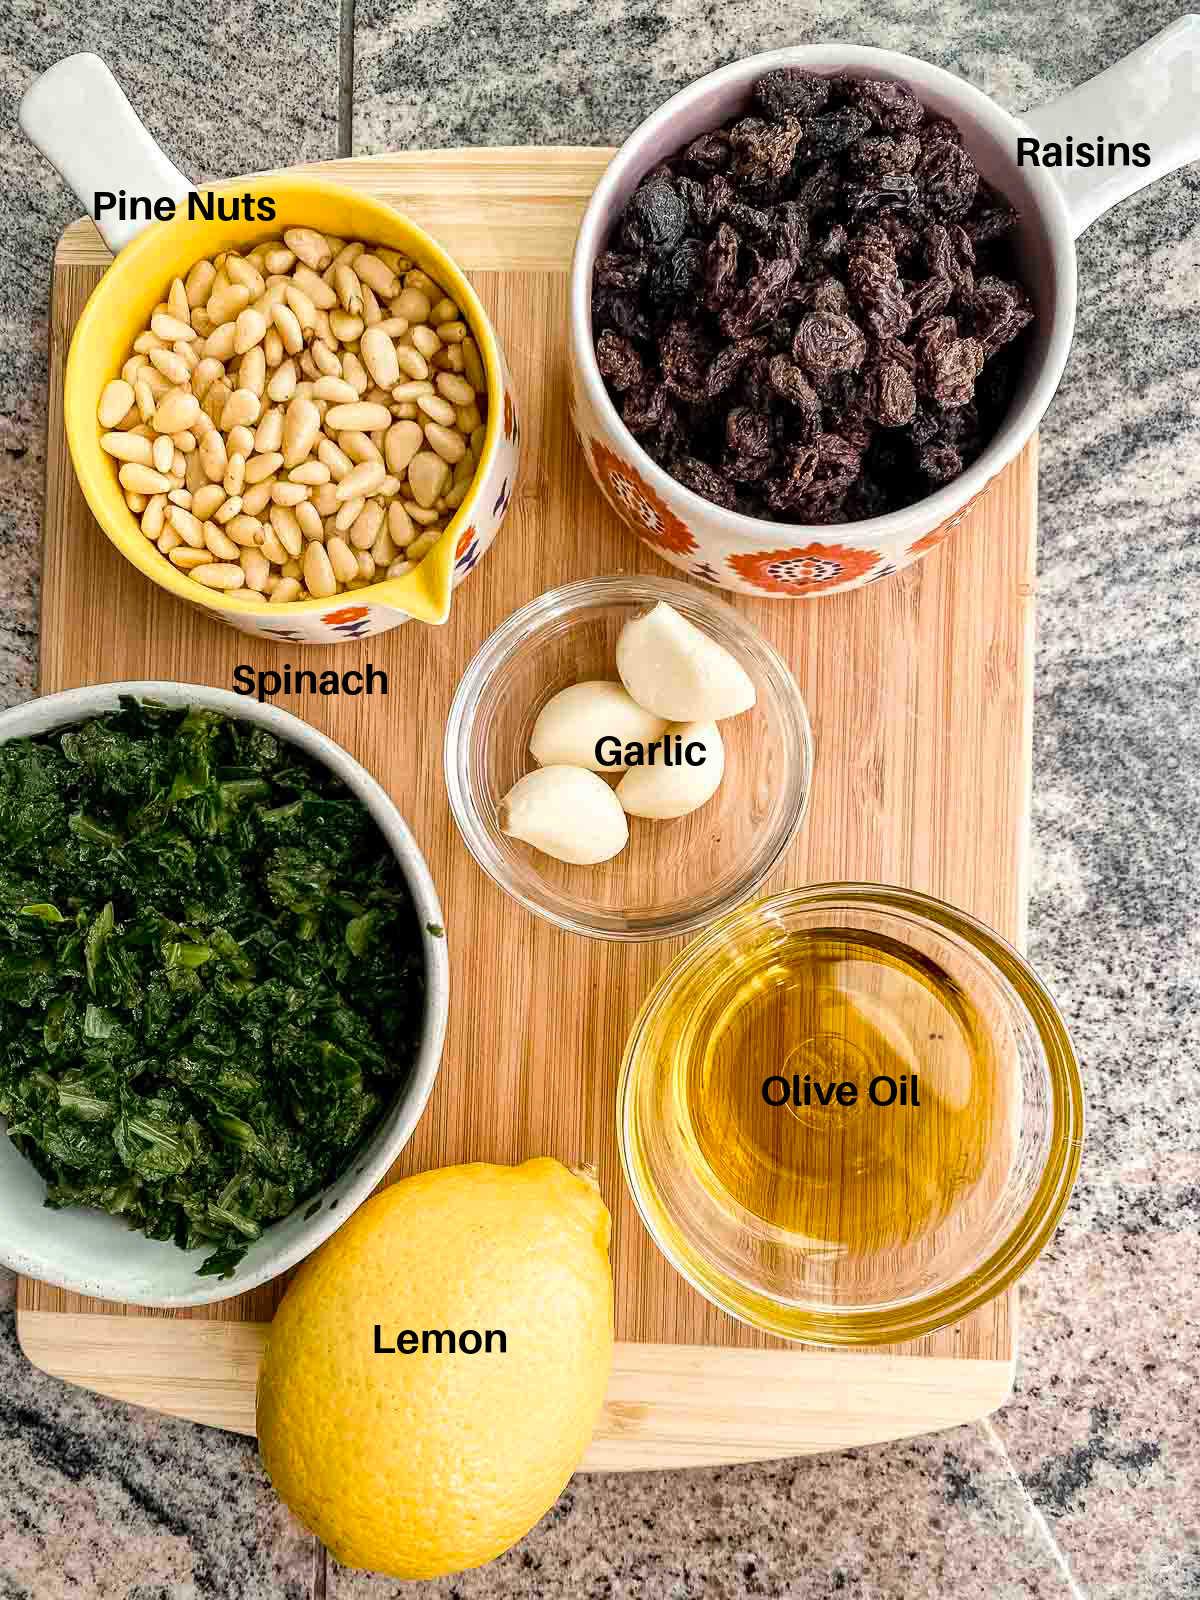 Ingredients to make espinacas a la catalana: spinach, raisins, olive oil, garlic, raisins, pine nuts and lemon